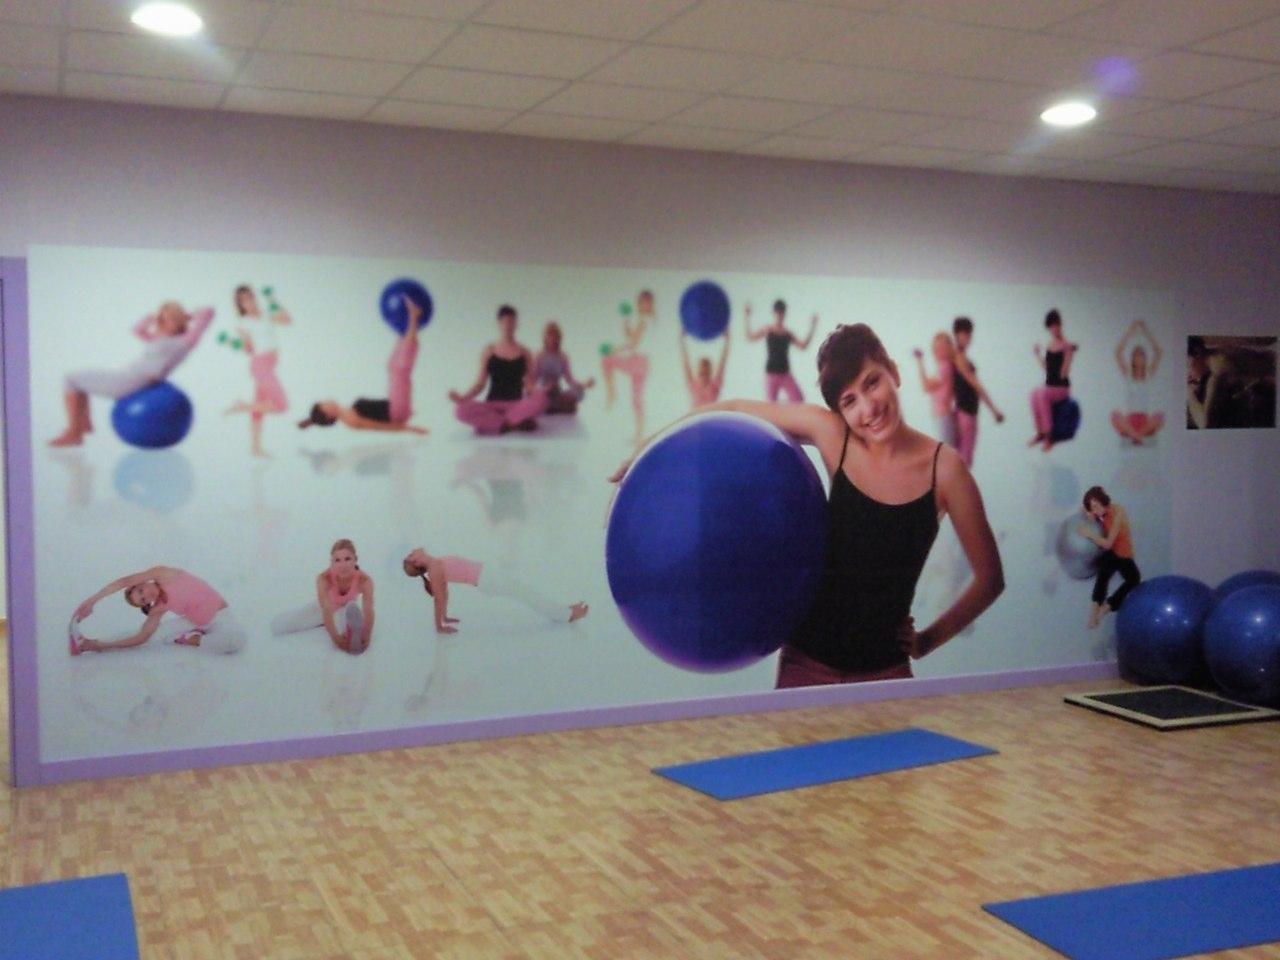 Artedecora blog de dise o gr fico - Decoracion gimnasio ...